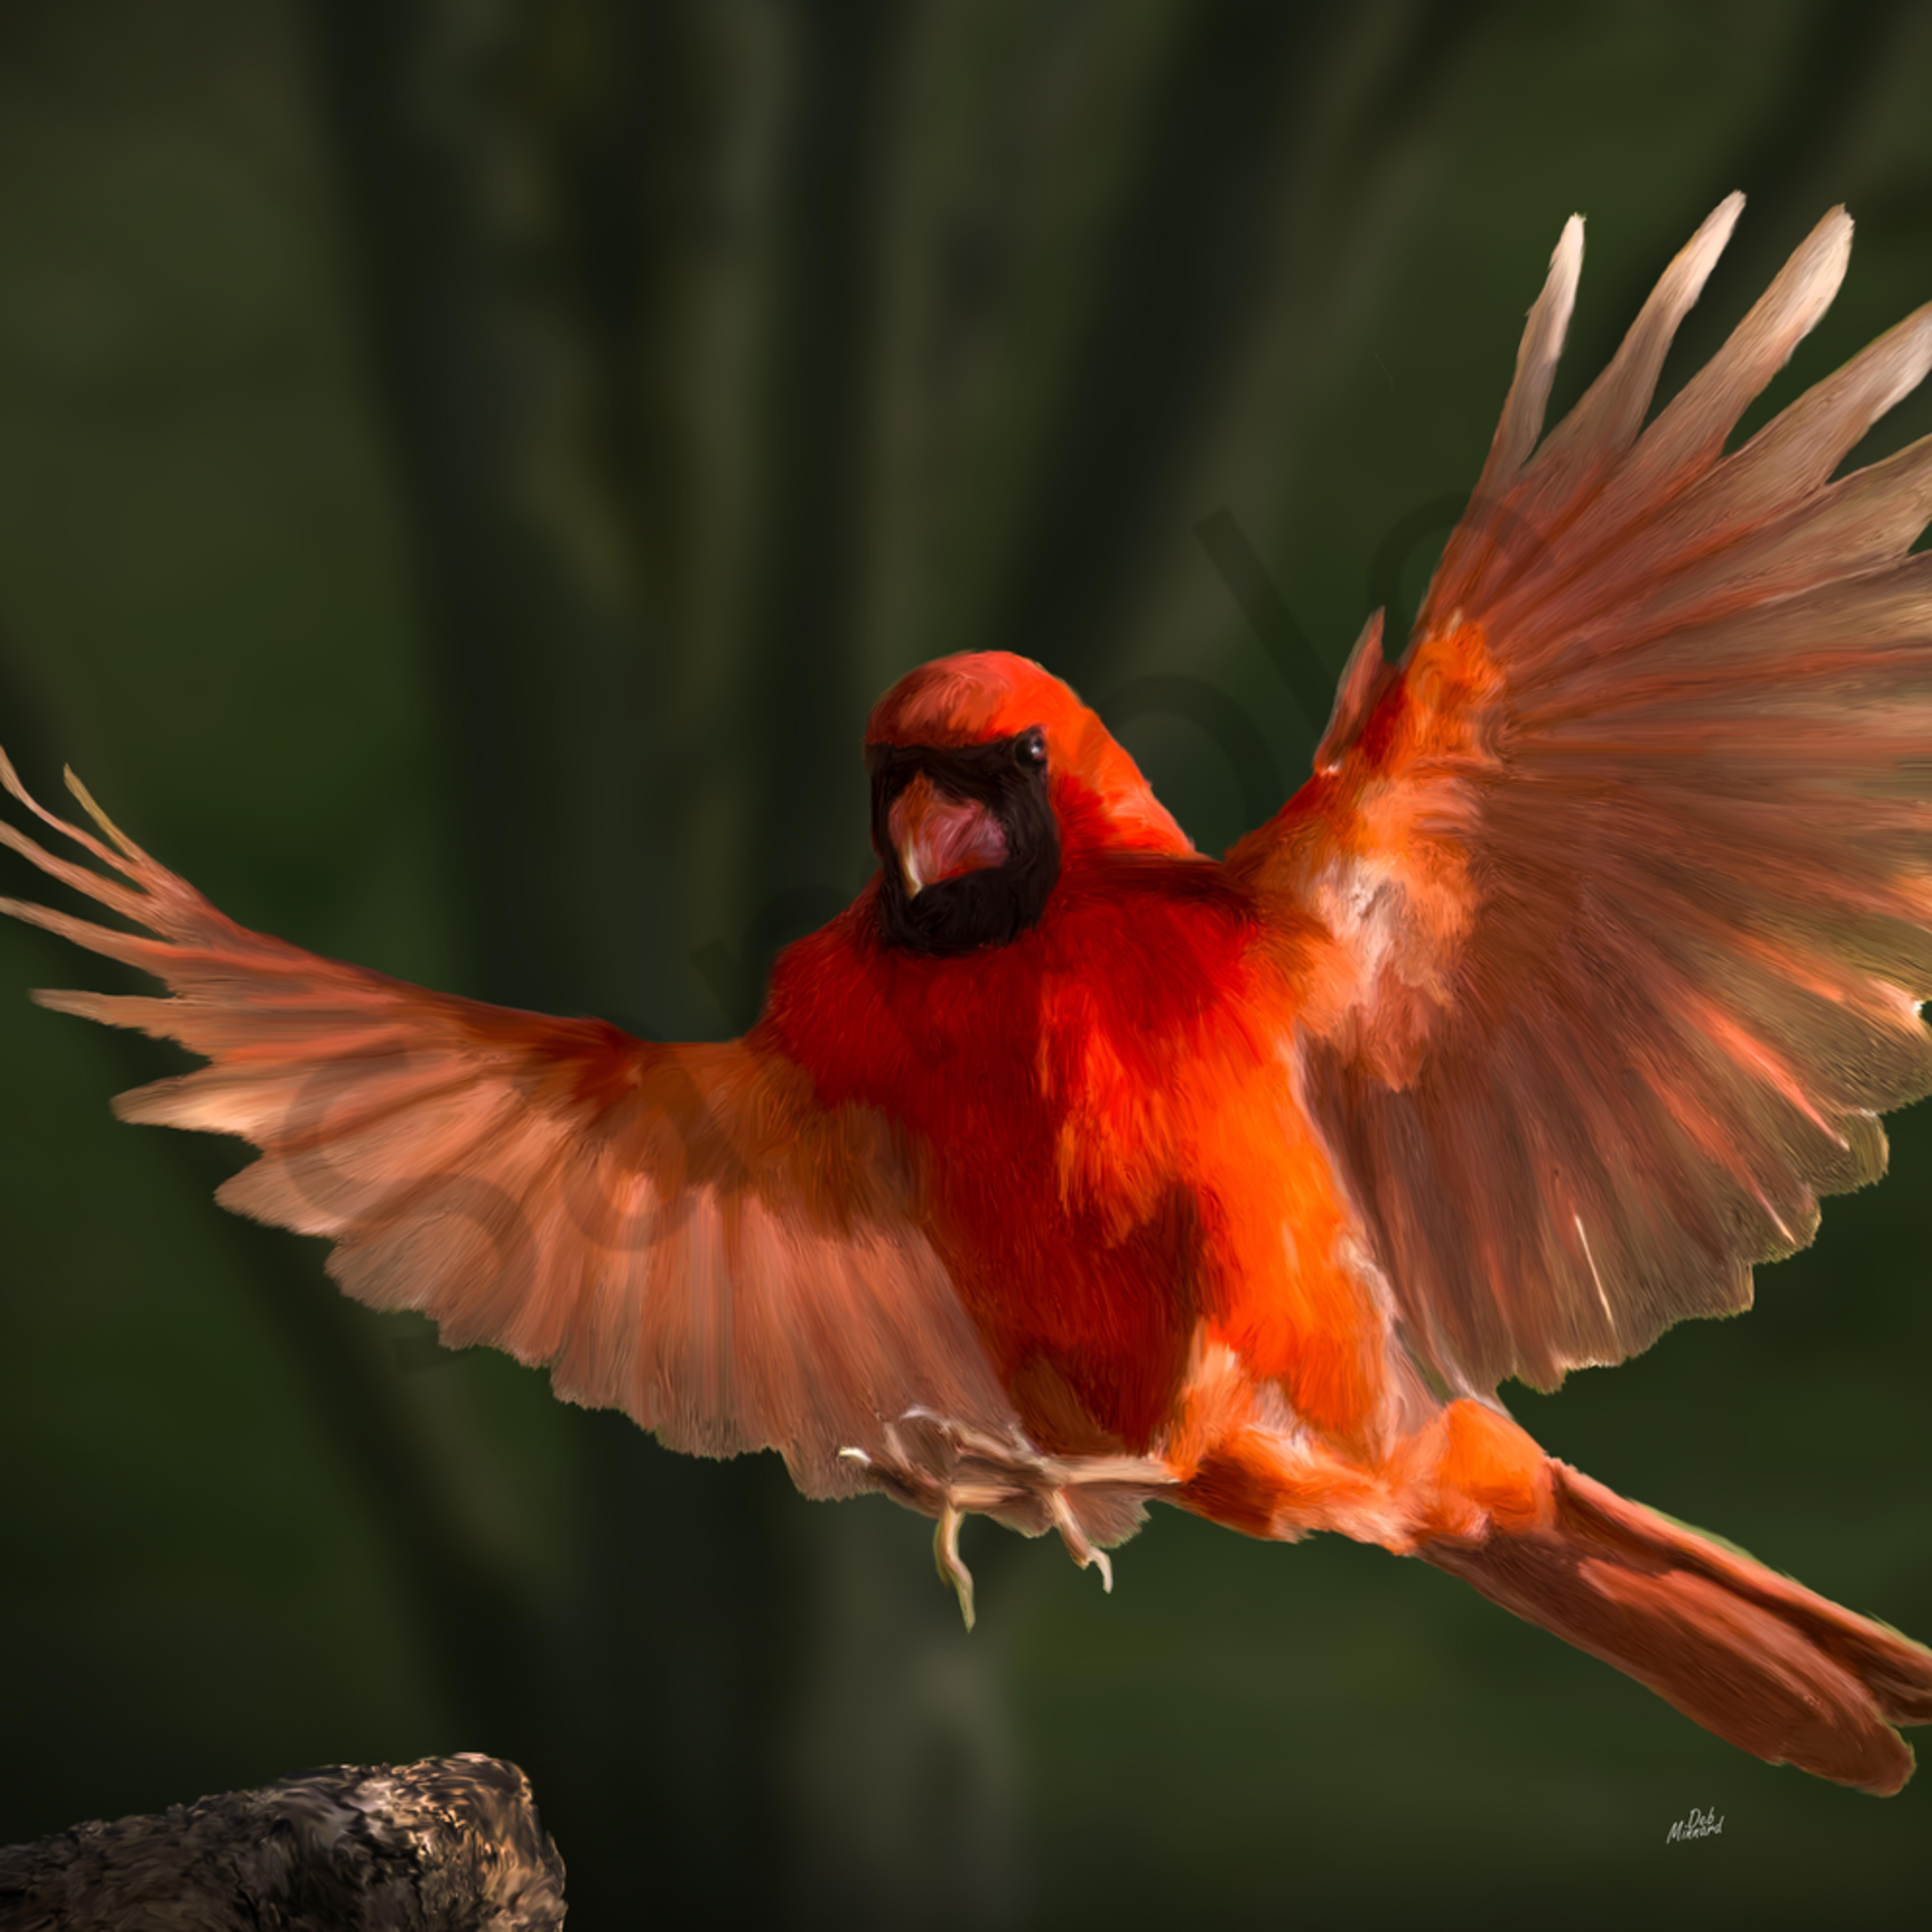 Cardinal in flight tvarmr